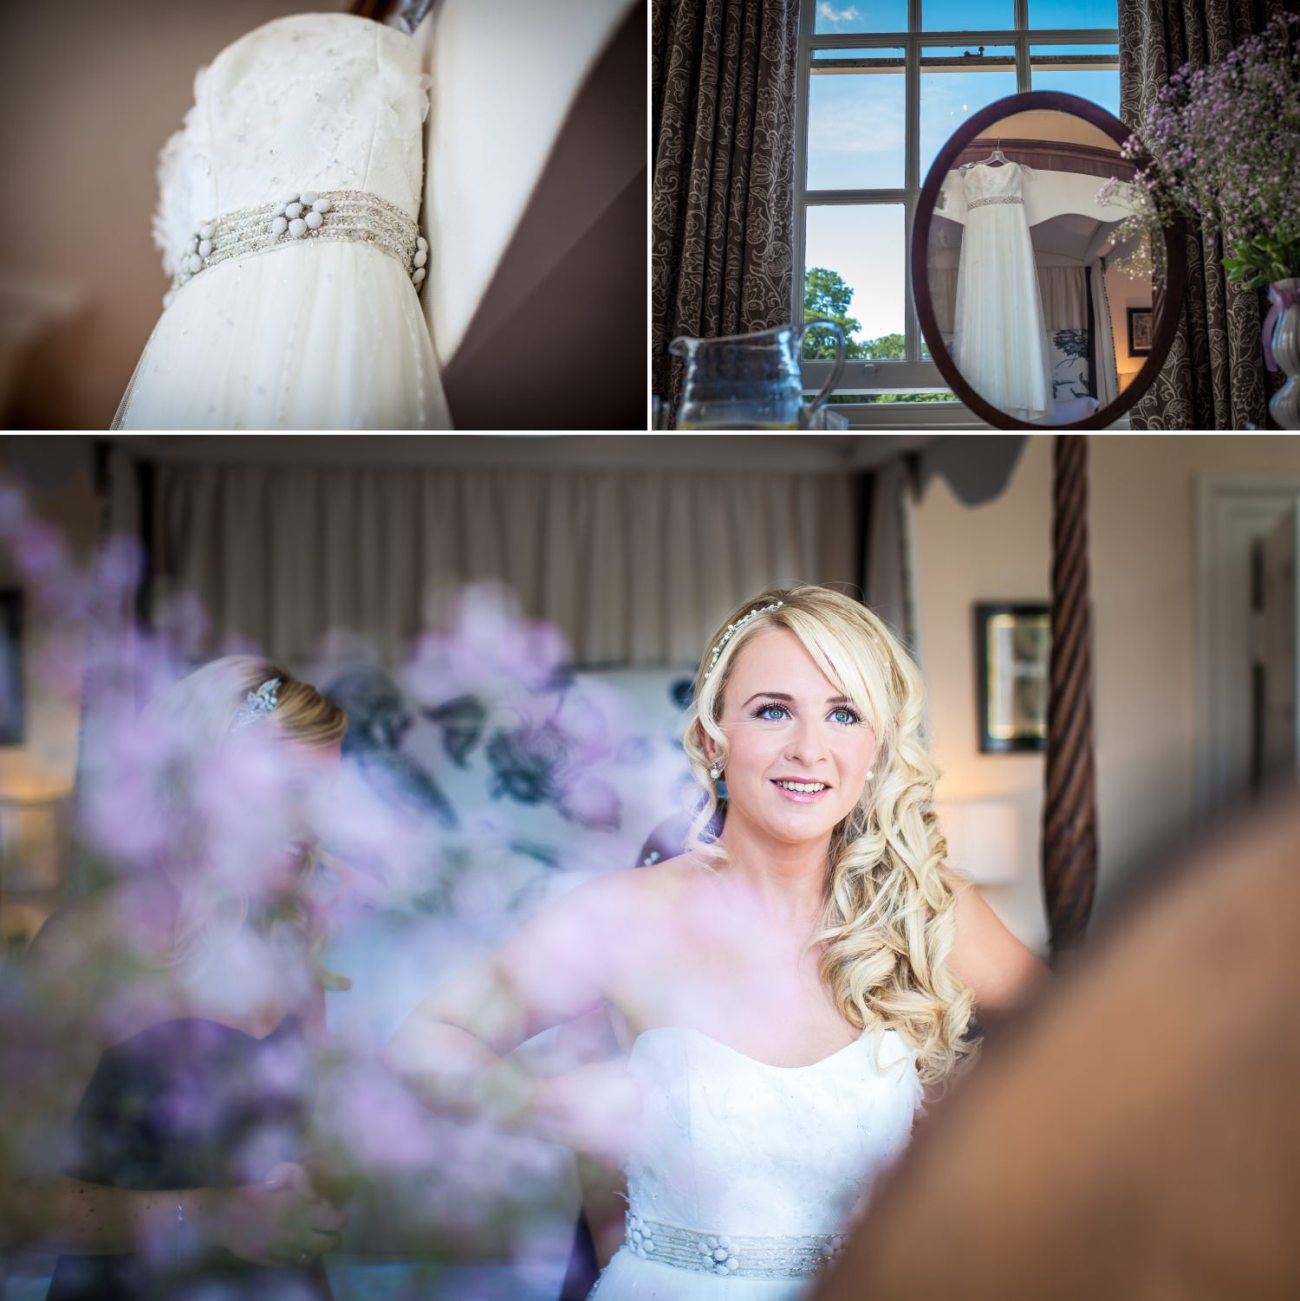 Wedding Photography of brides wedding dress and bride at Iscoyd Park